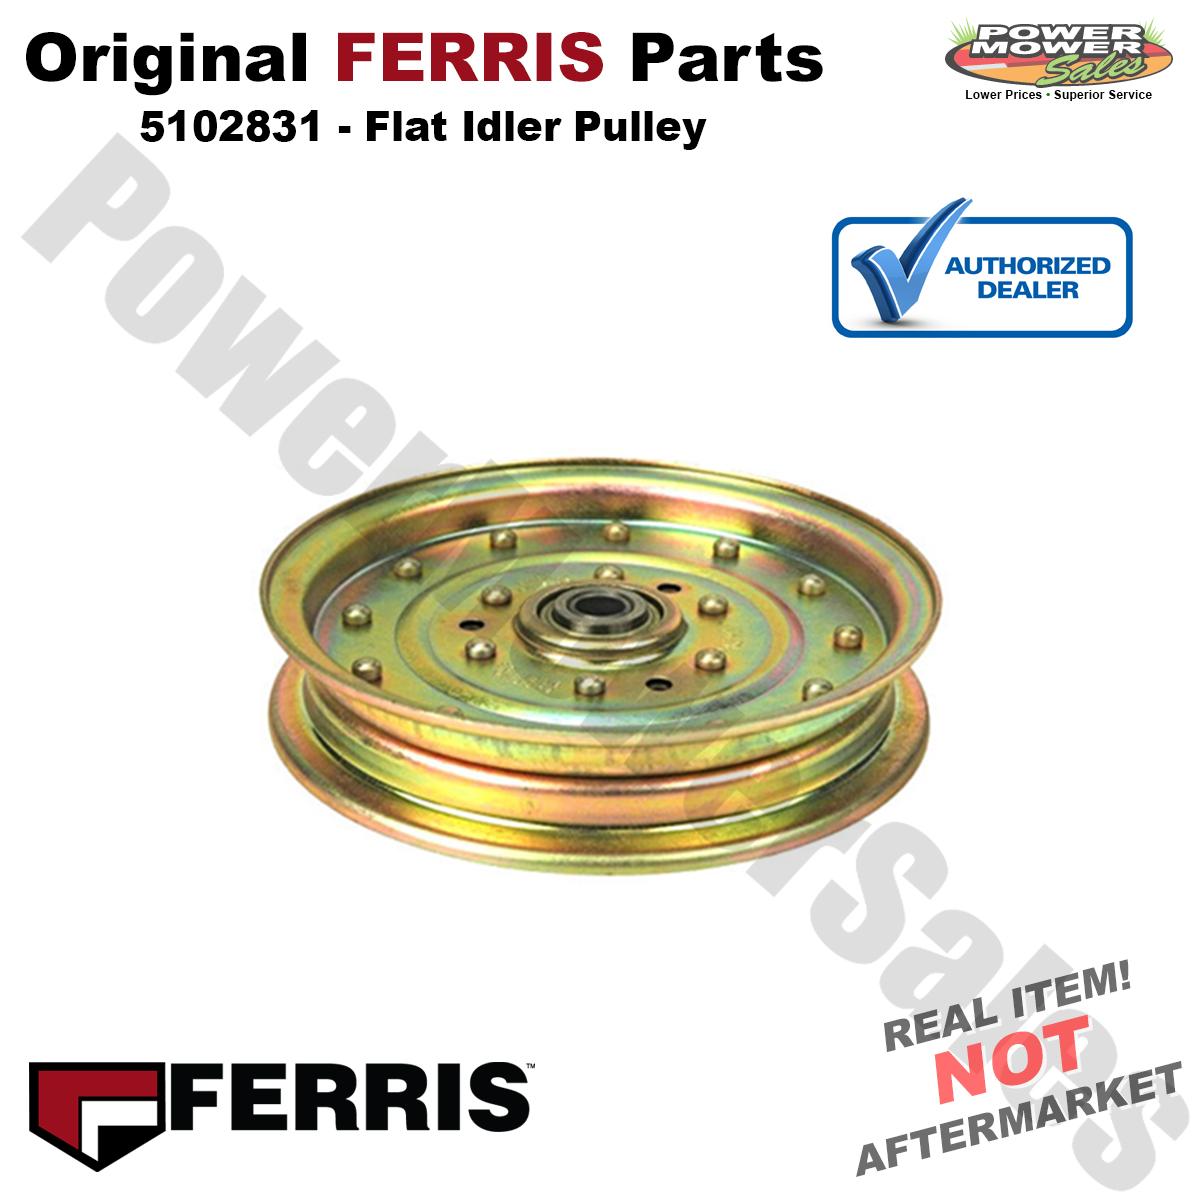 Ferris 5104191 Pulley Flat Idler 3-1 4 Flan